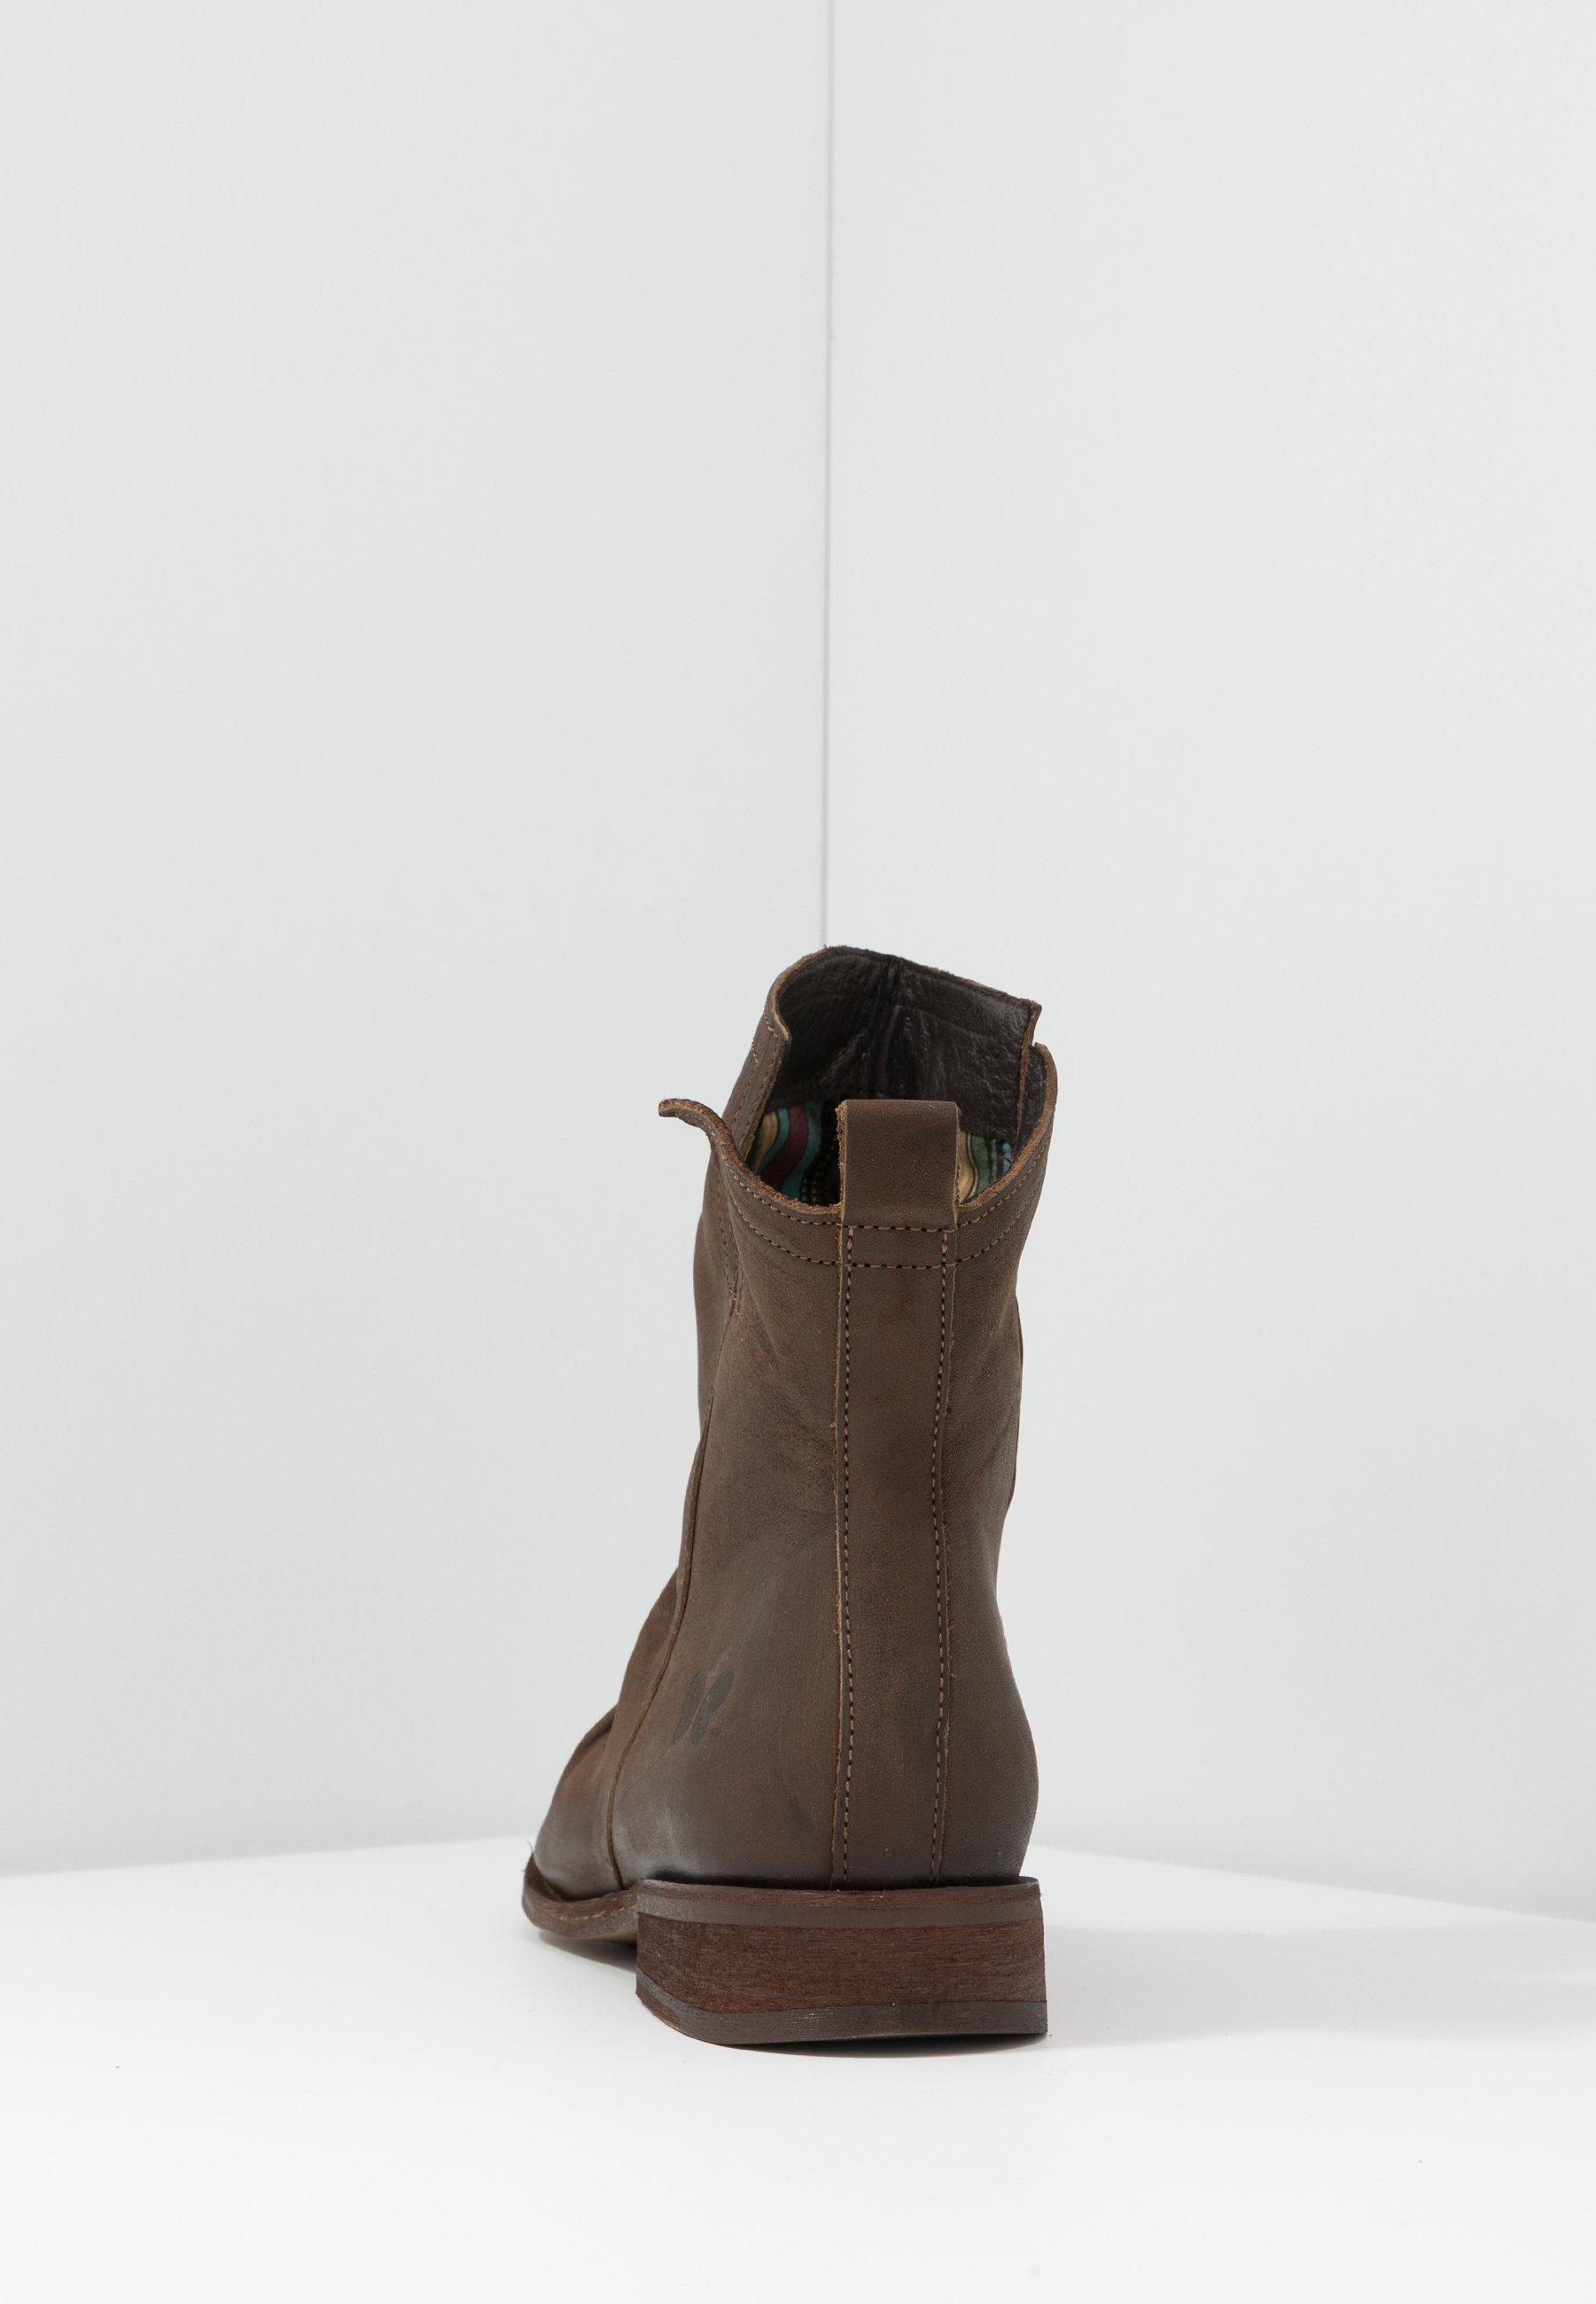 Felmini Serpa - Stiefelette Cobre/braun